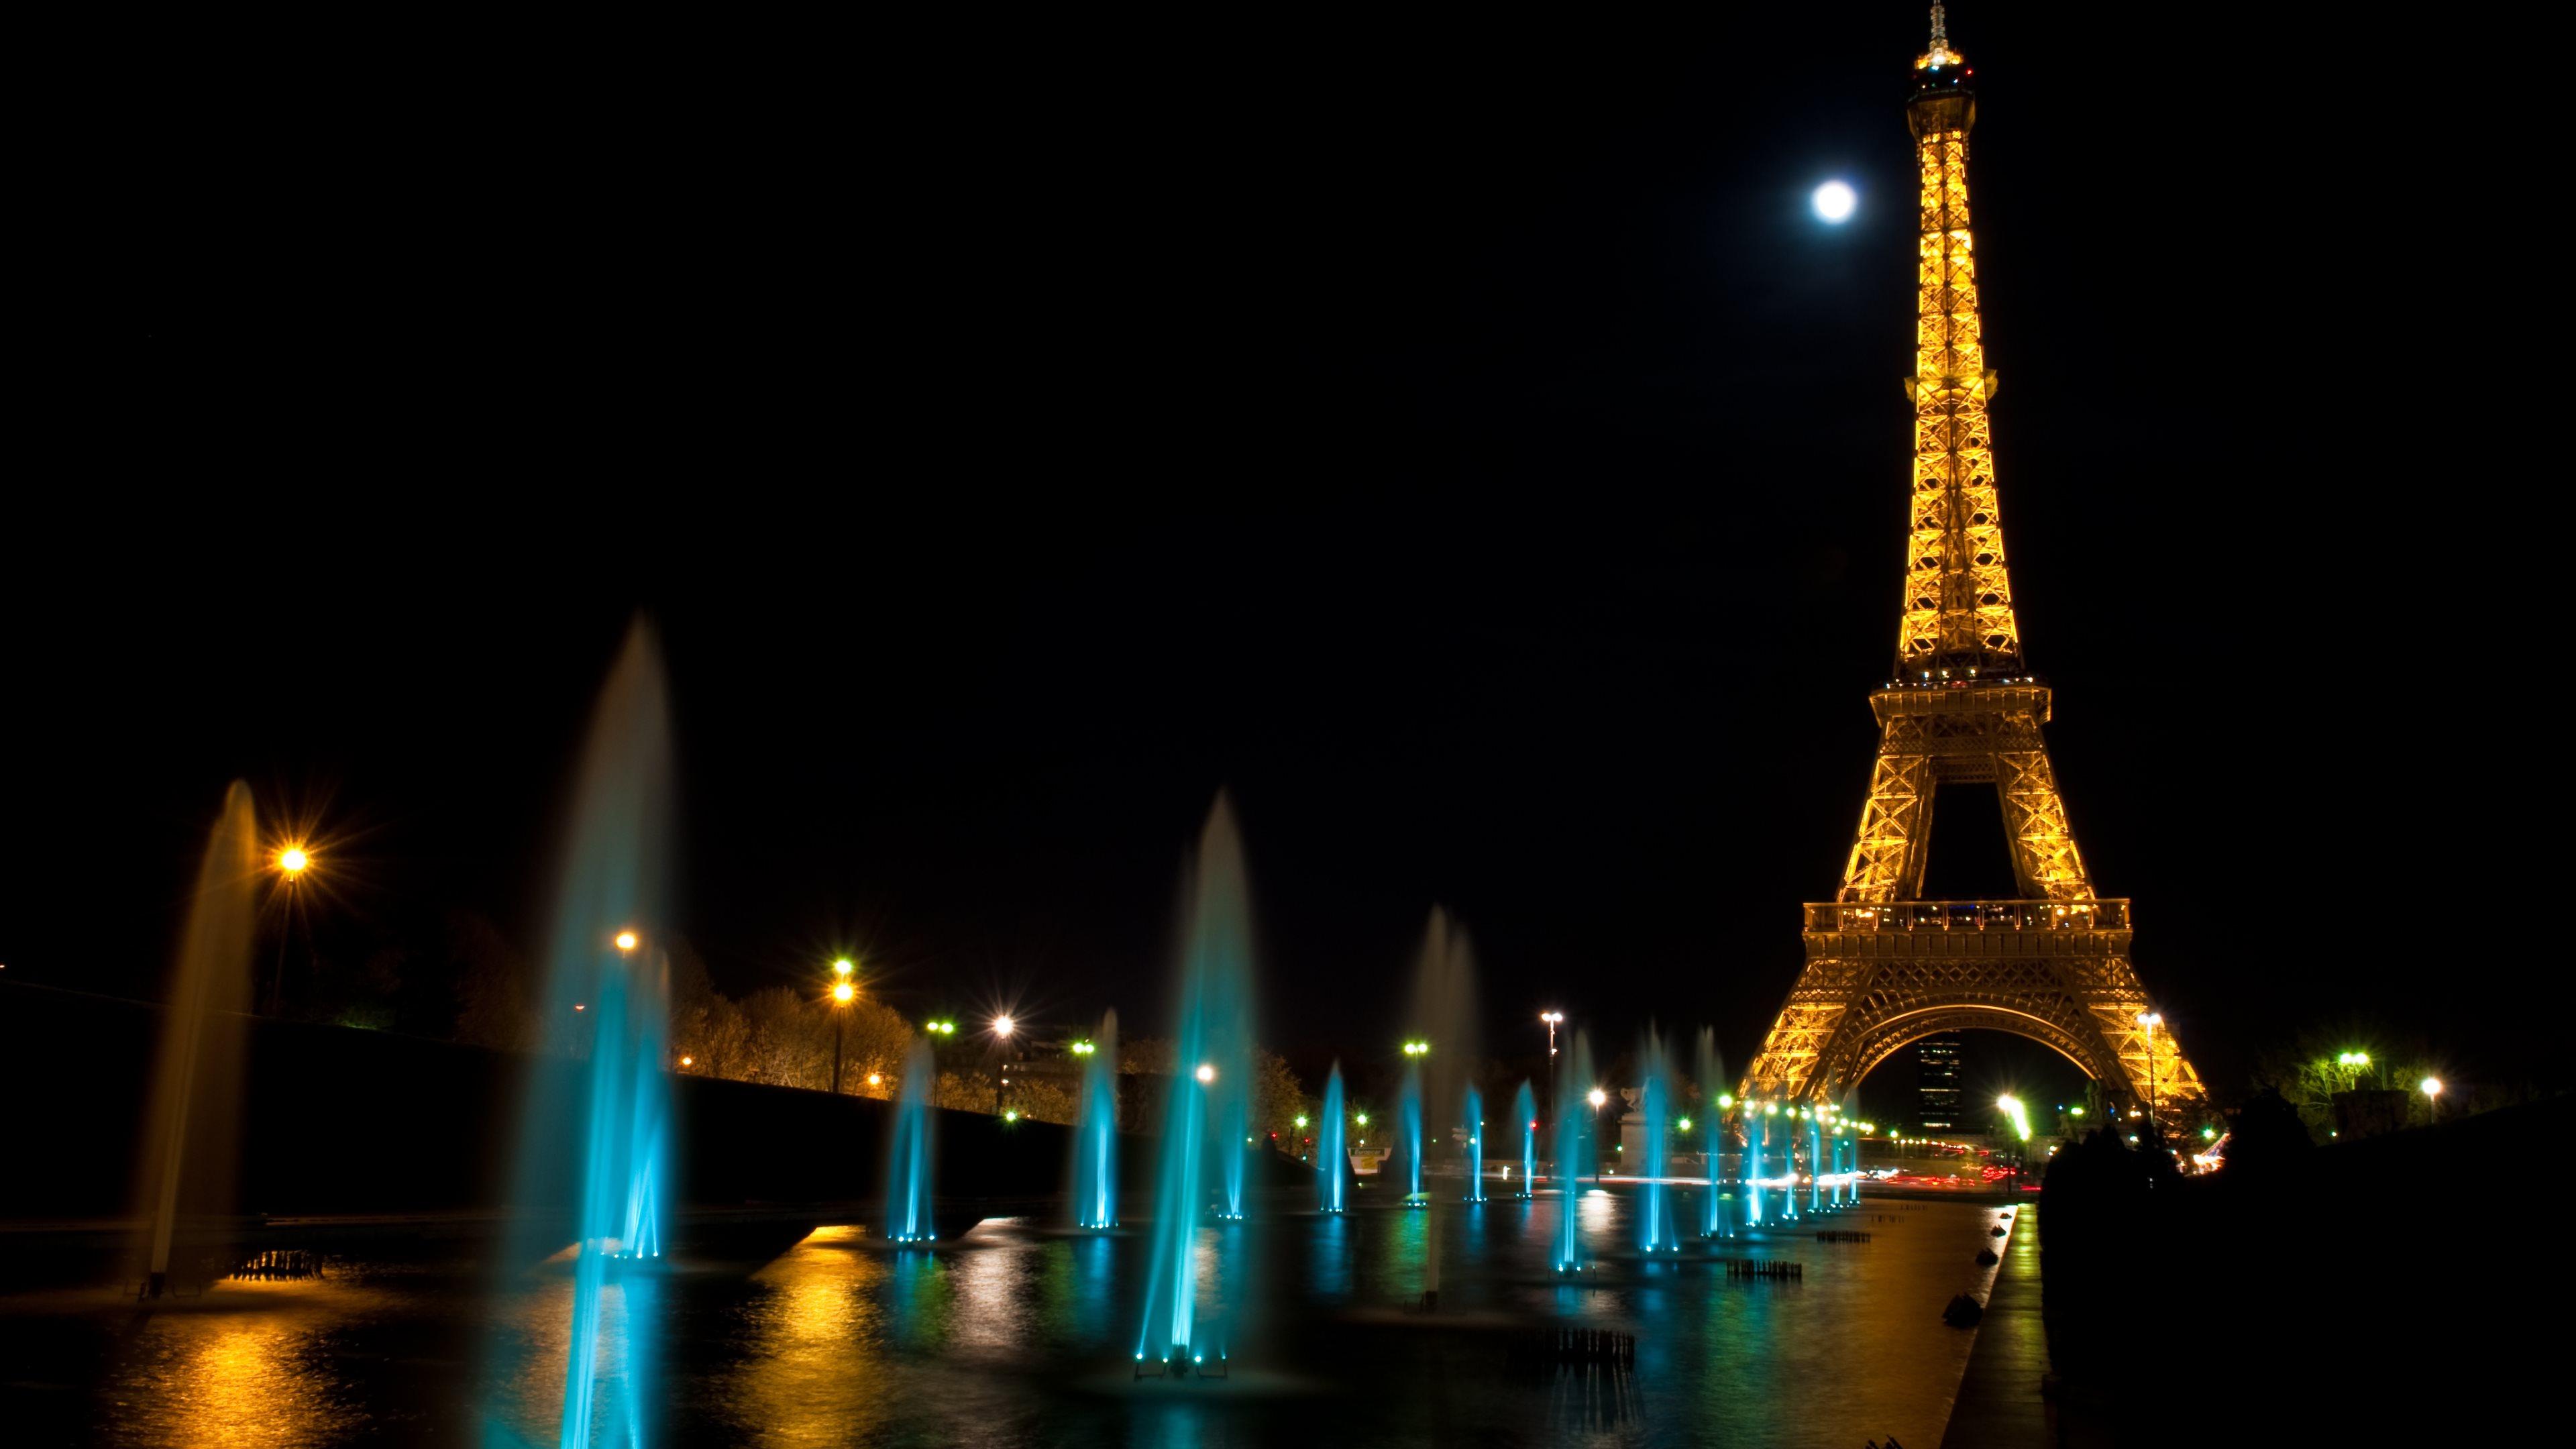 Paris At Night. Tour Eiffel HD Wallpapers